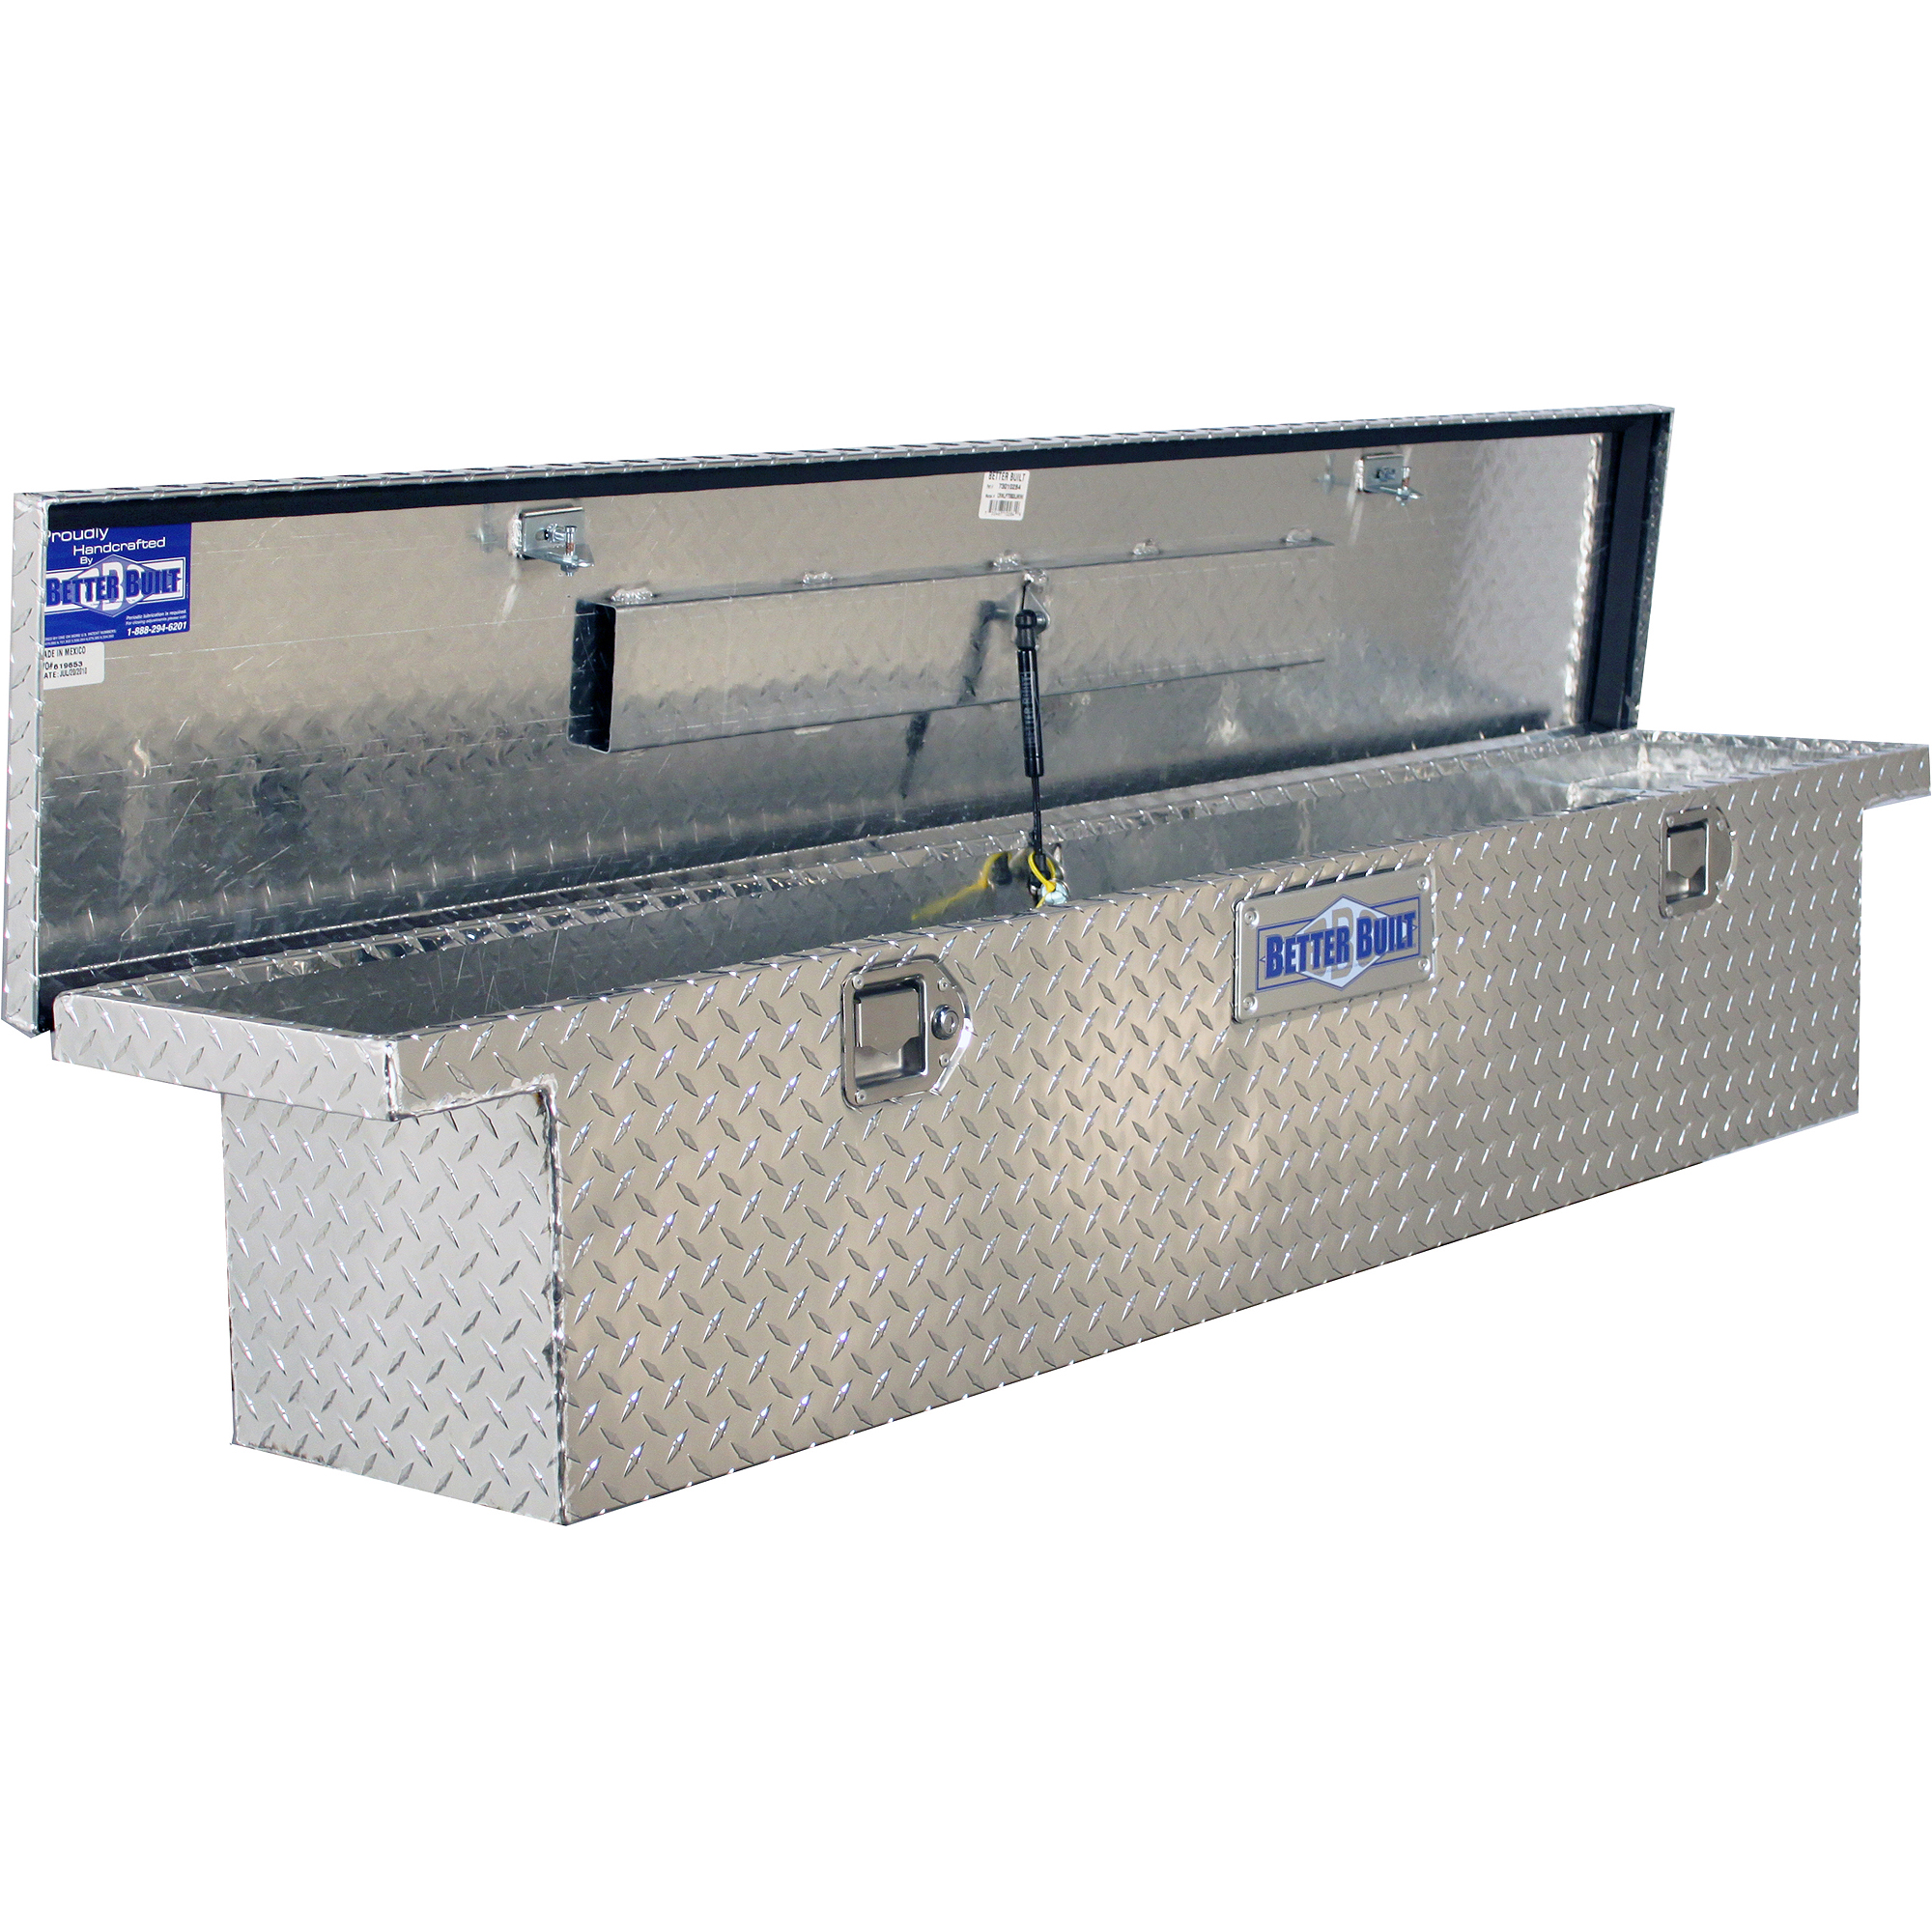 Low Profile Truck Bed Tool Box >> Better Built Full Size Low Profile Slimline Truck Box 720467102849 | eBay